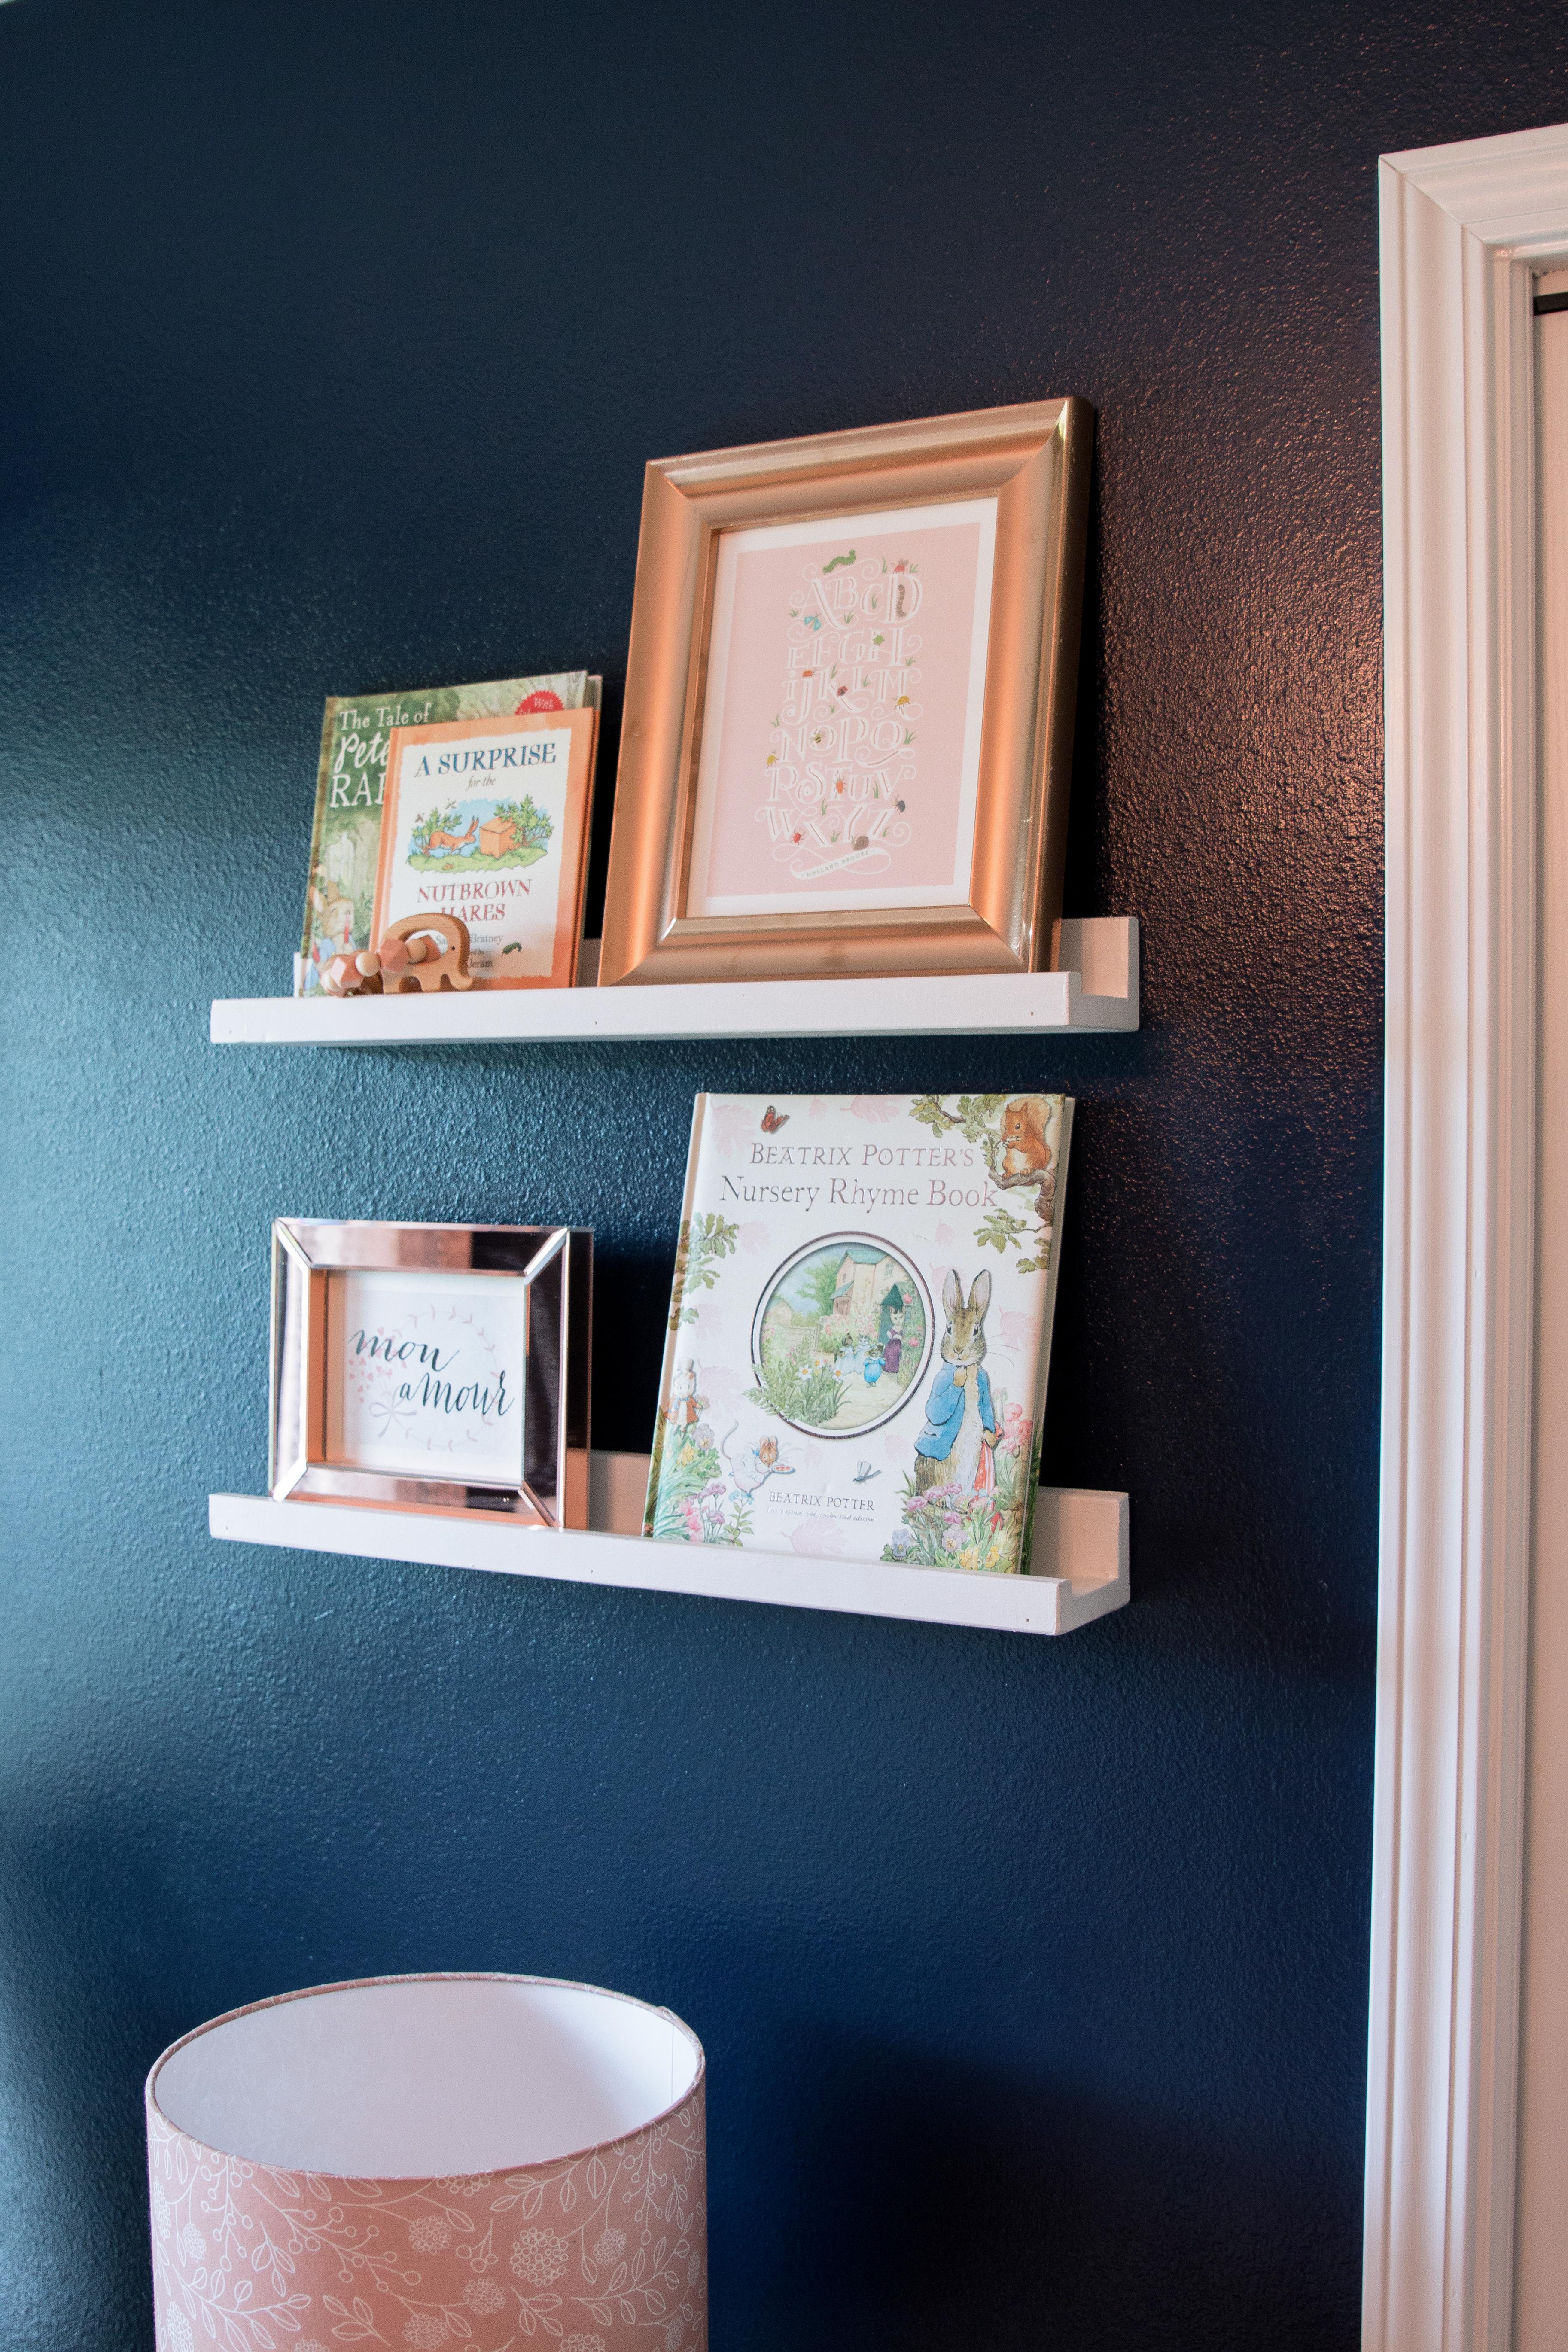 Nursery Book and Photo Ledges